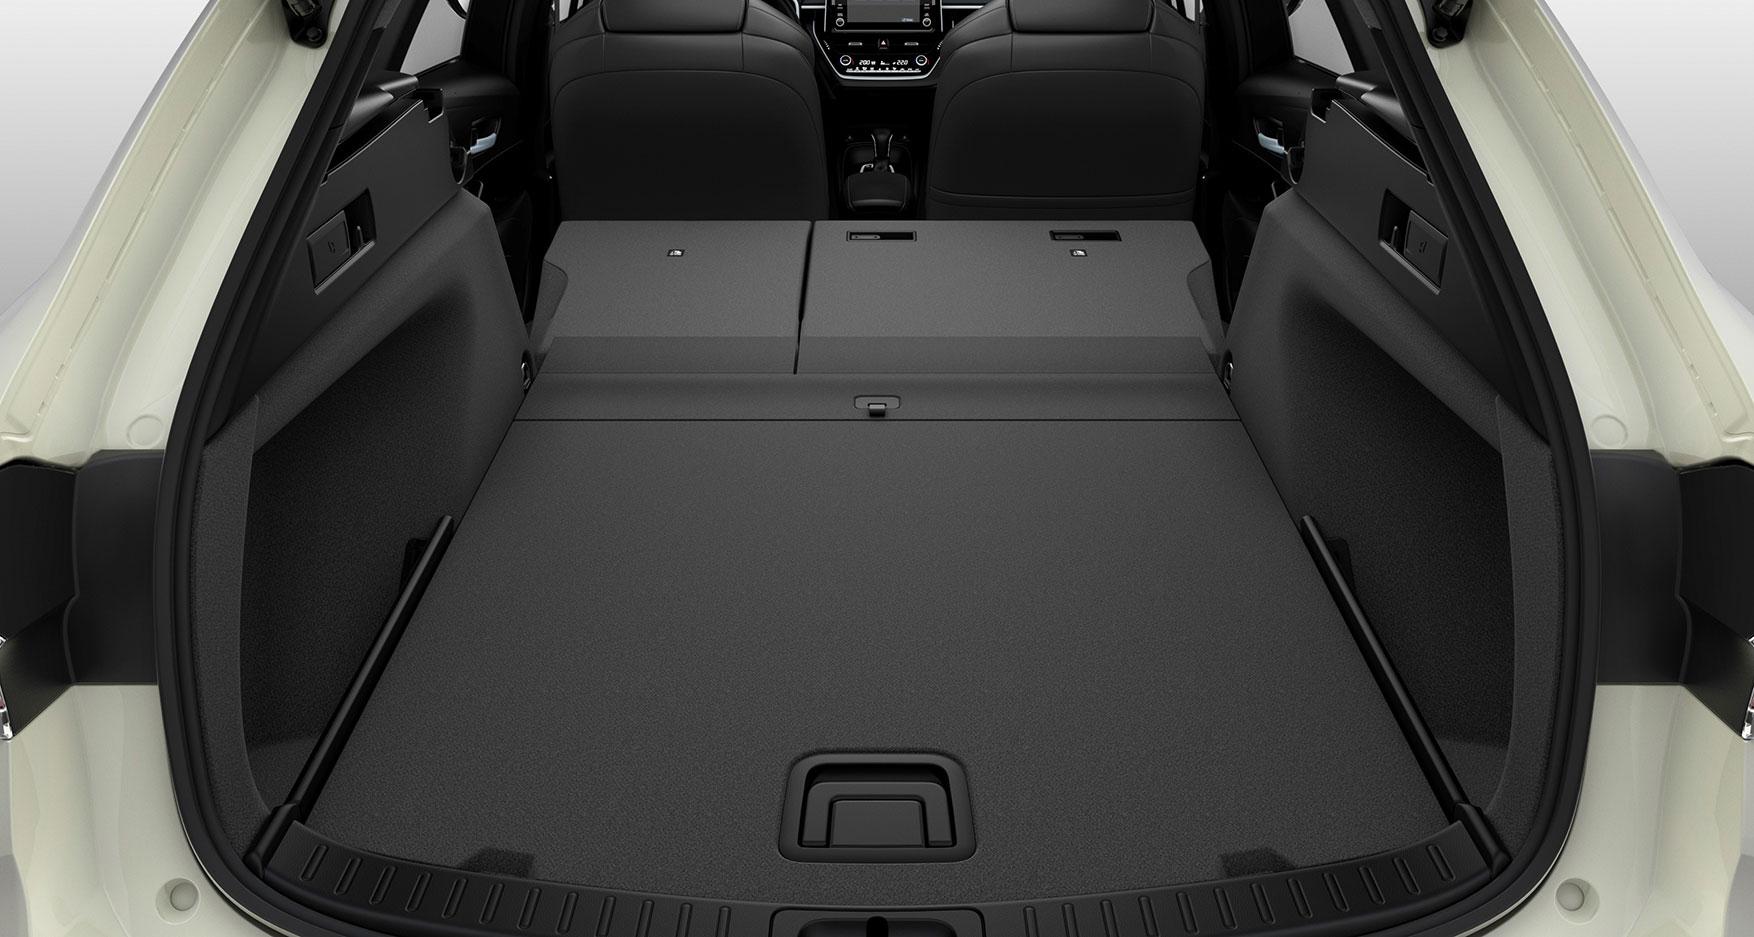 Suzuki Swace 2020 - Rear seats folded